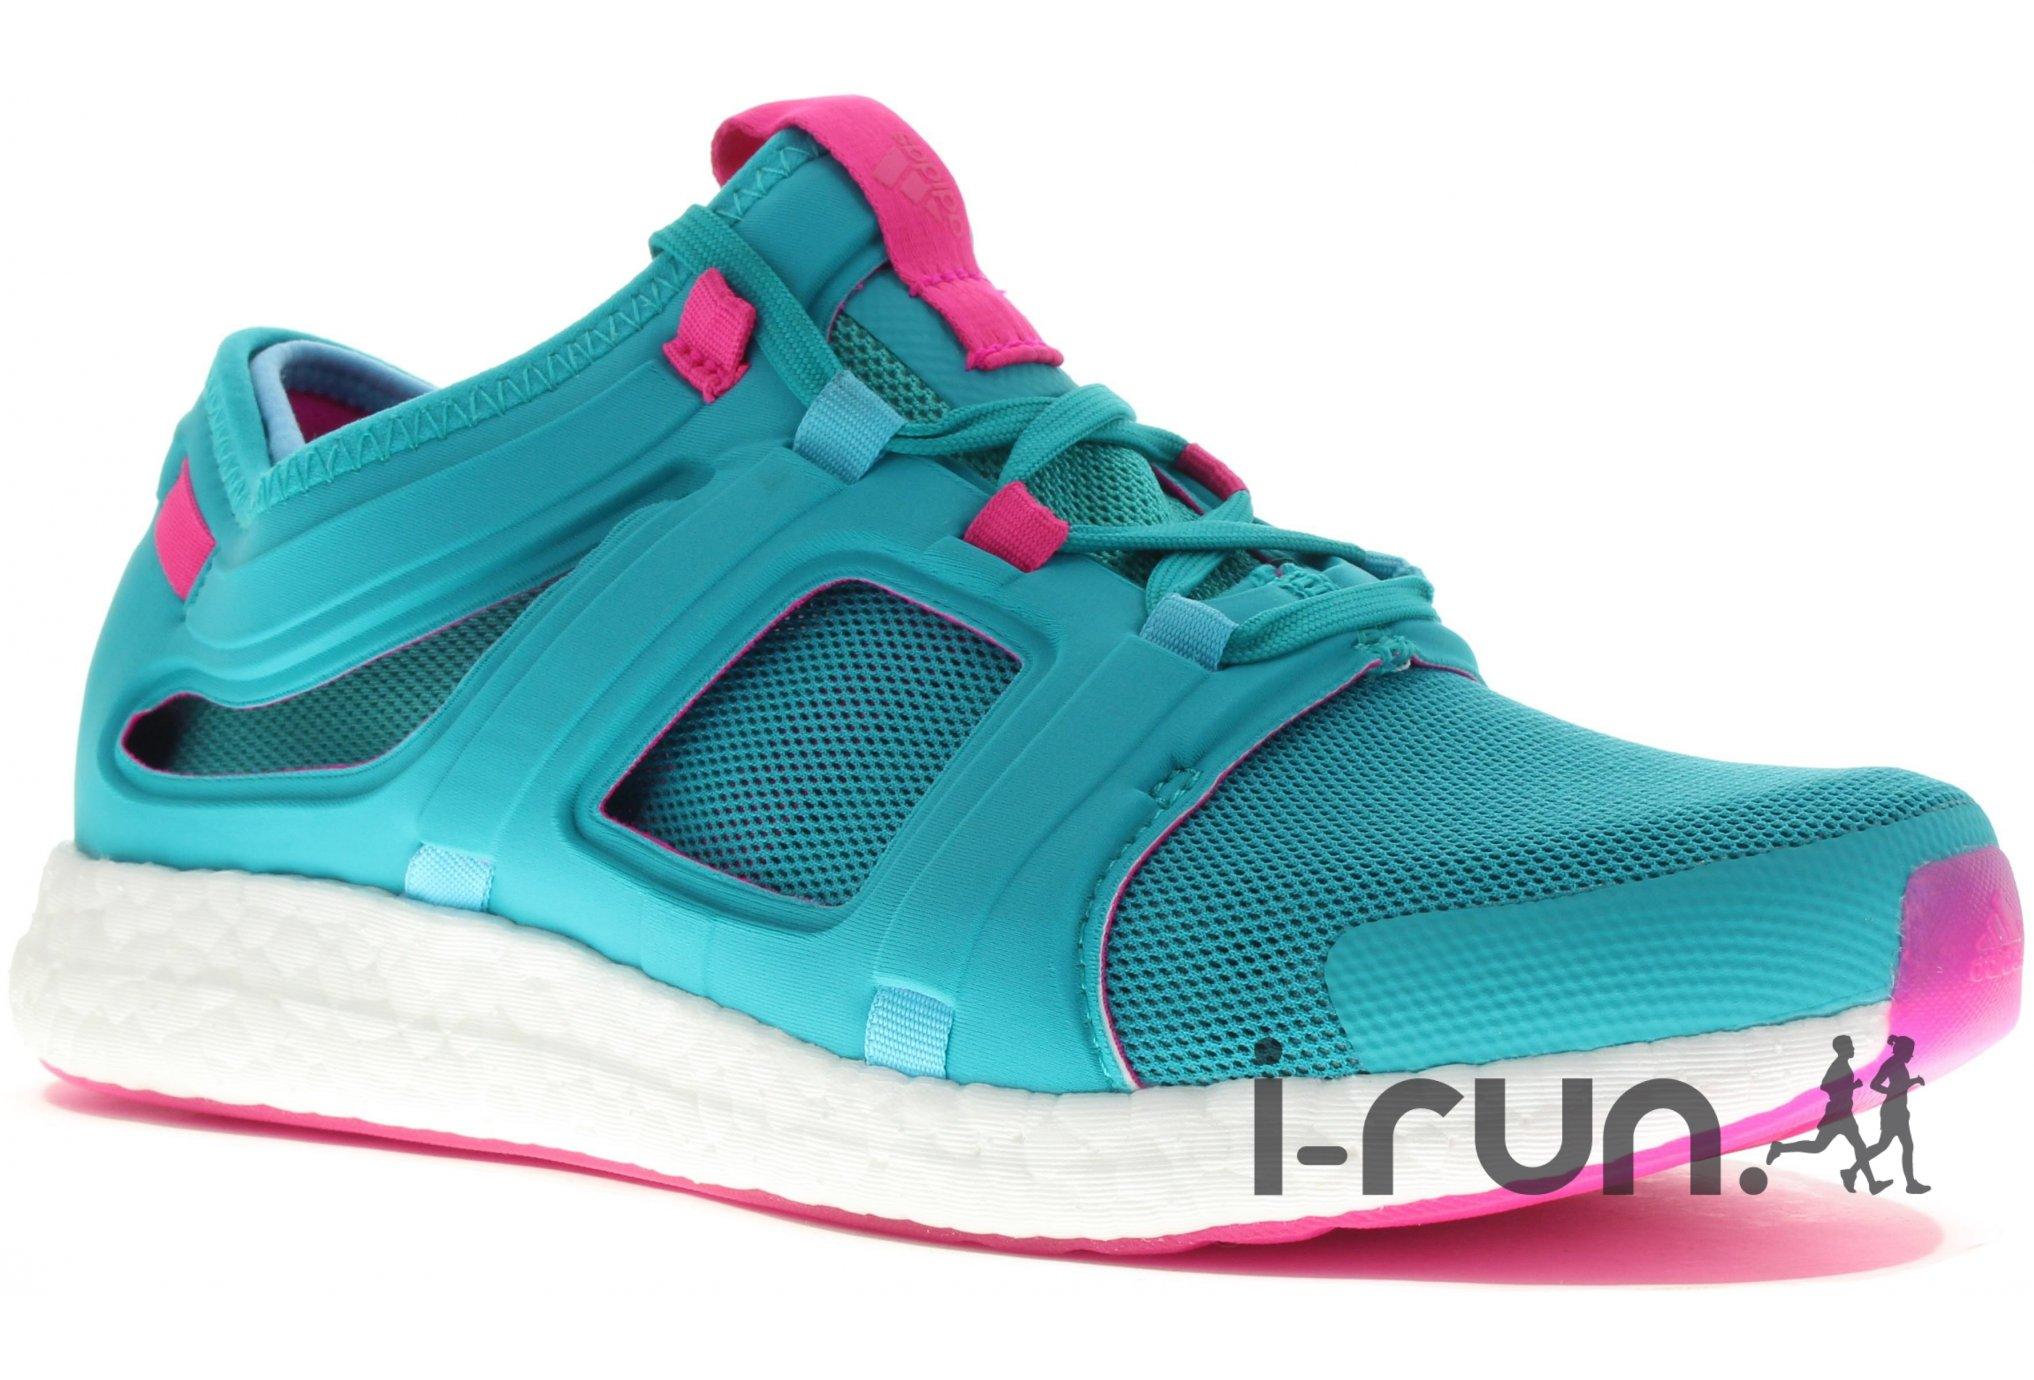 Adidas Climachill rocket boost w chaussures running femme